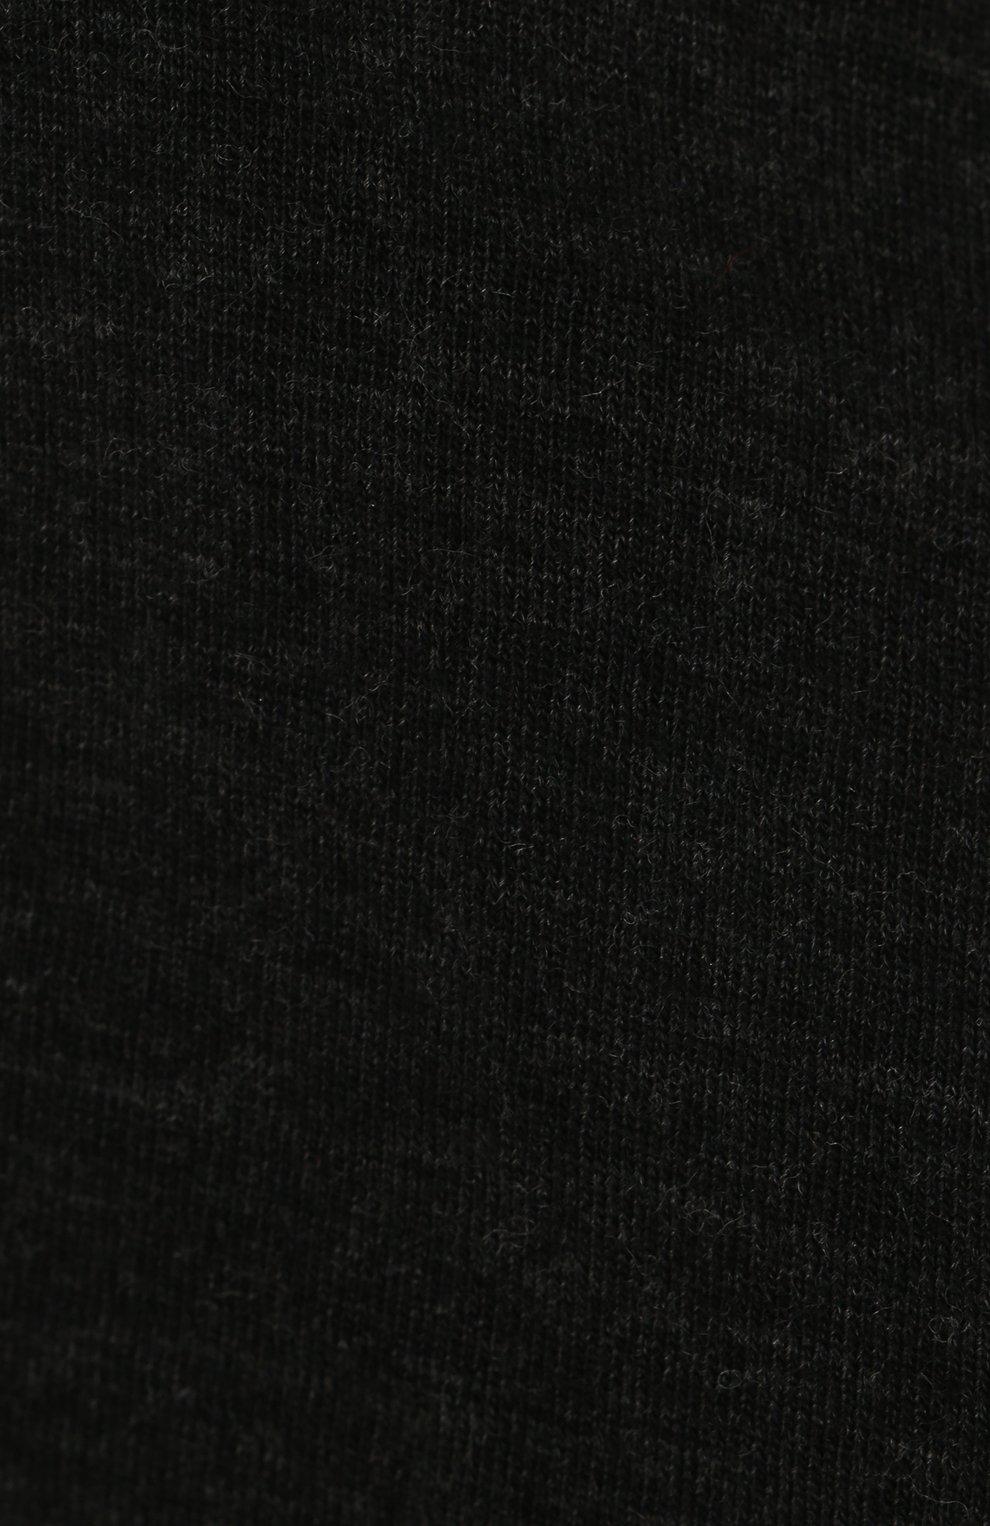 Колготки Softmerino из смеси шерсти и хлопка Falke темно-серые | Фото №3